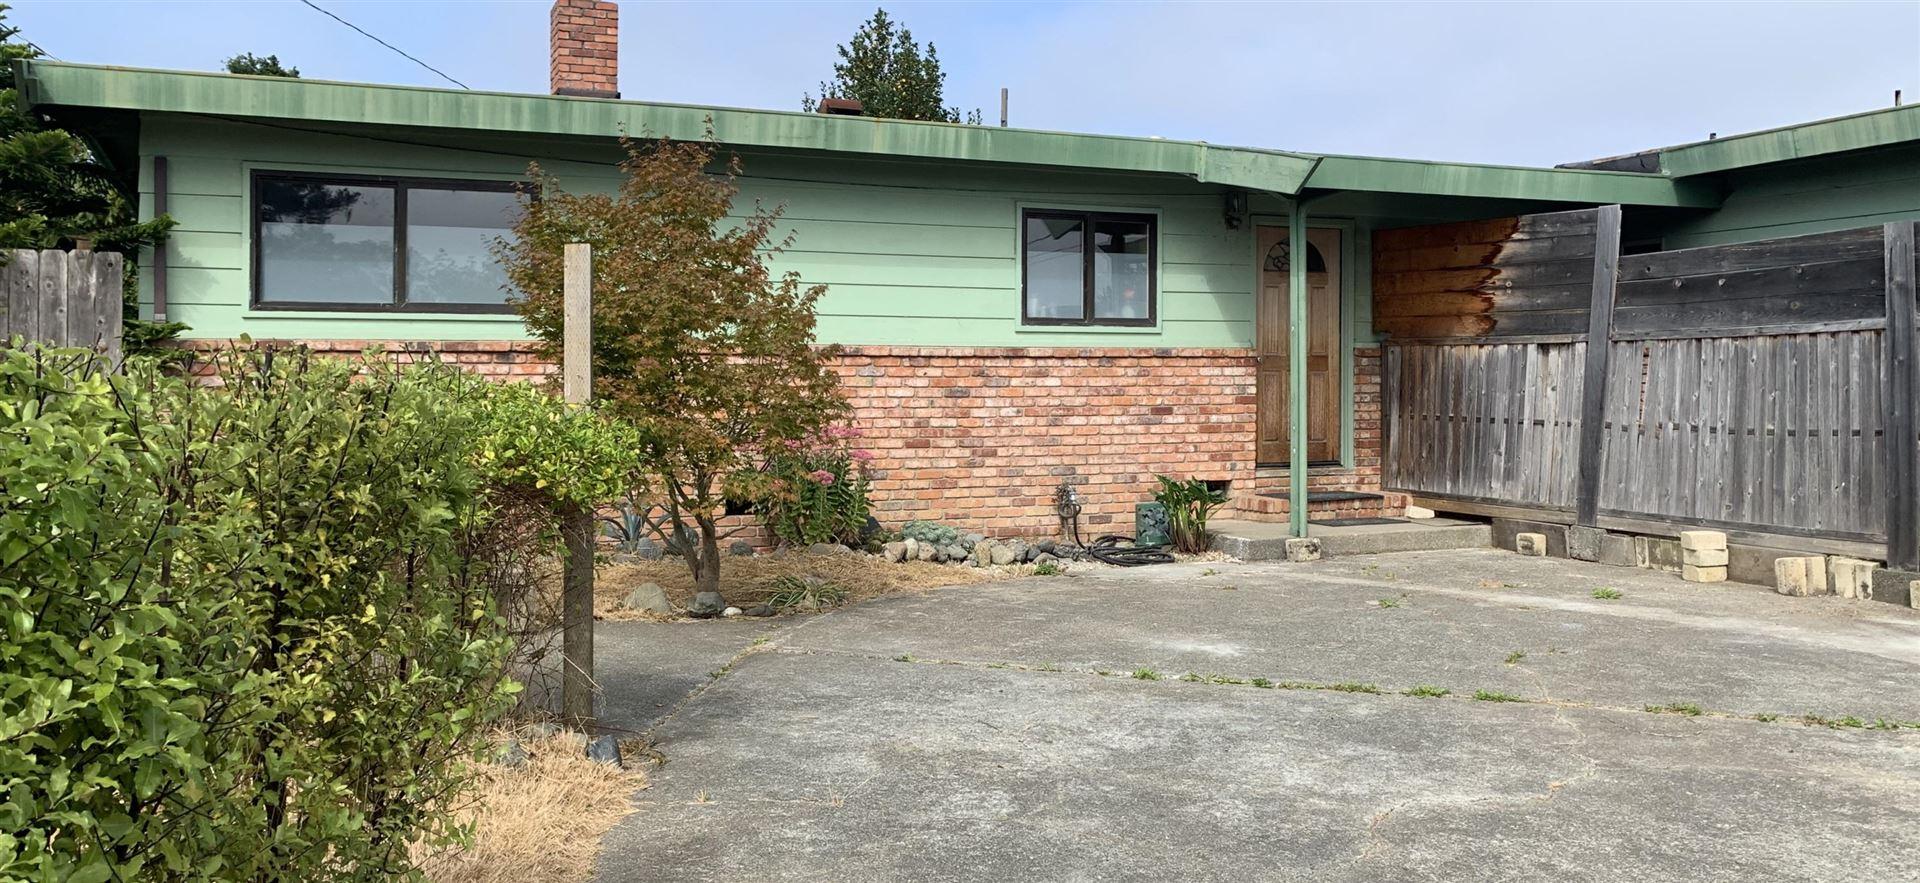 1962 Quaker Street, Eureka, CA 95501 - MLS#: 257315